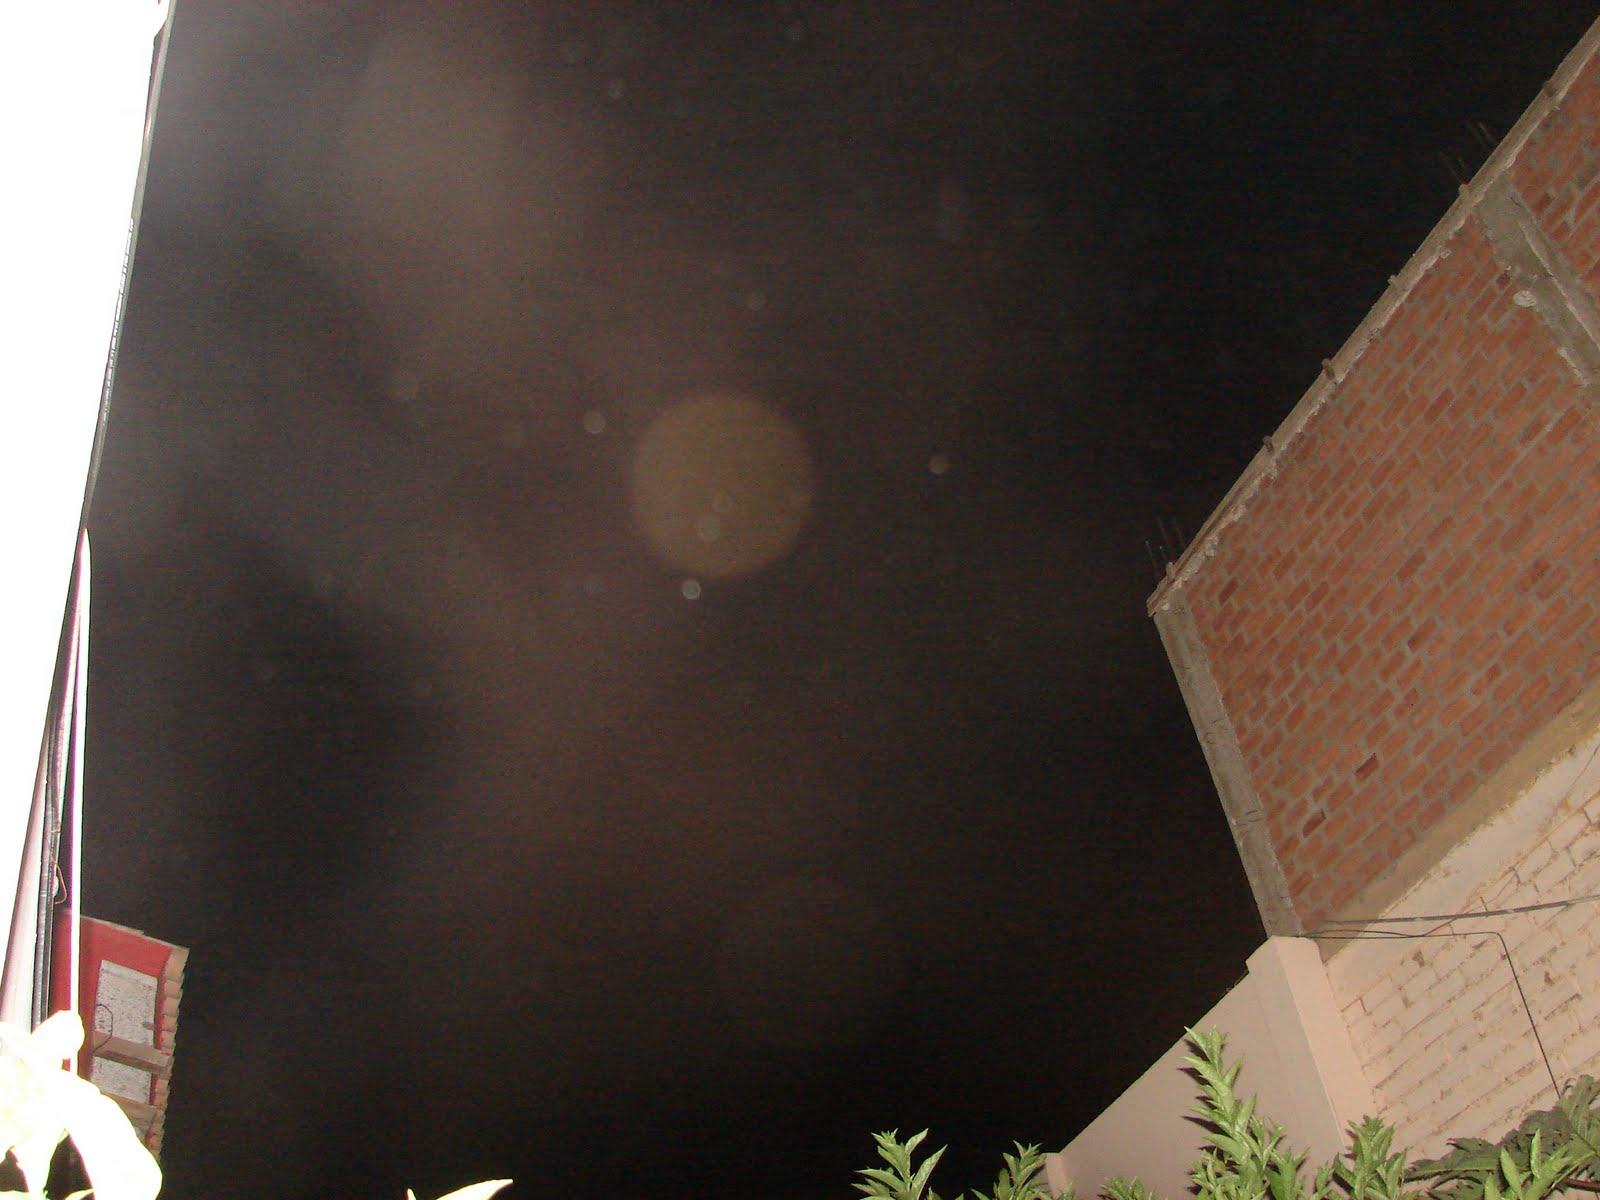 alertas-12-septiembre-13-14-15-16-17...2011 avistamiento.Ovni.´´X´´rojisa-ALIEN por 4ta noche seg